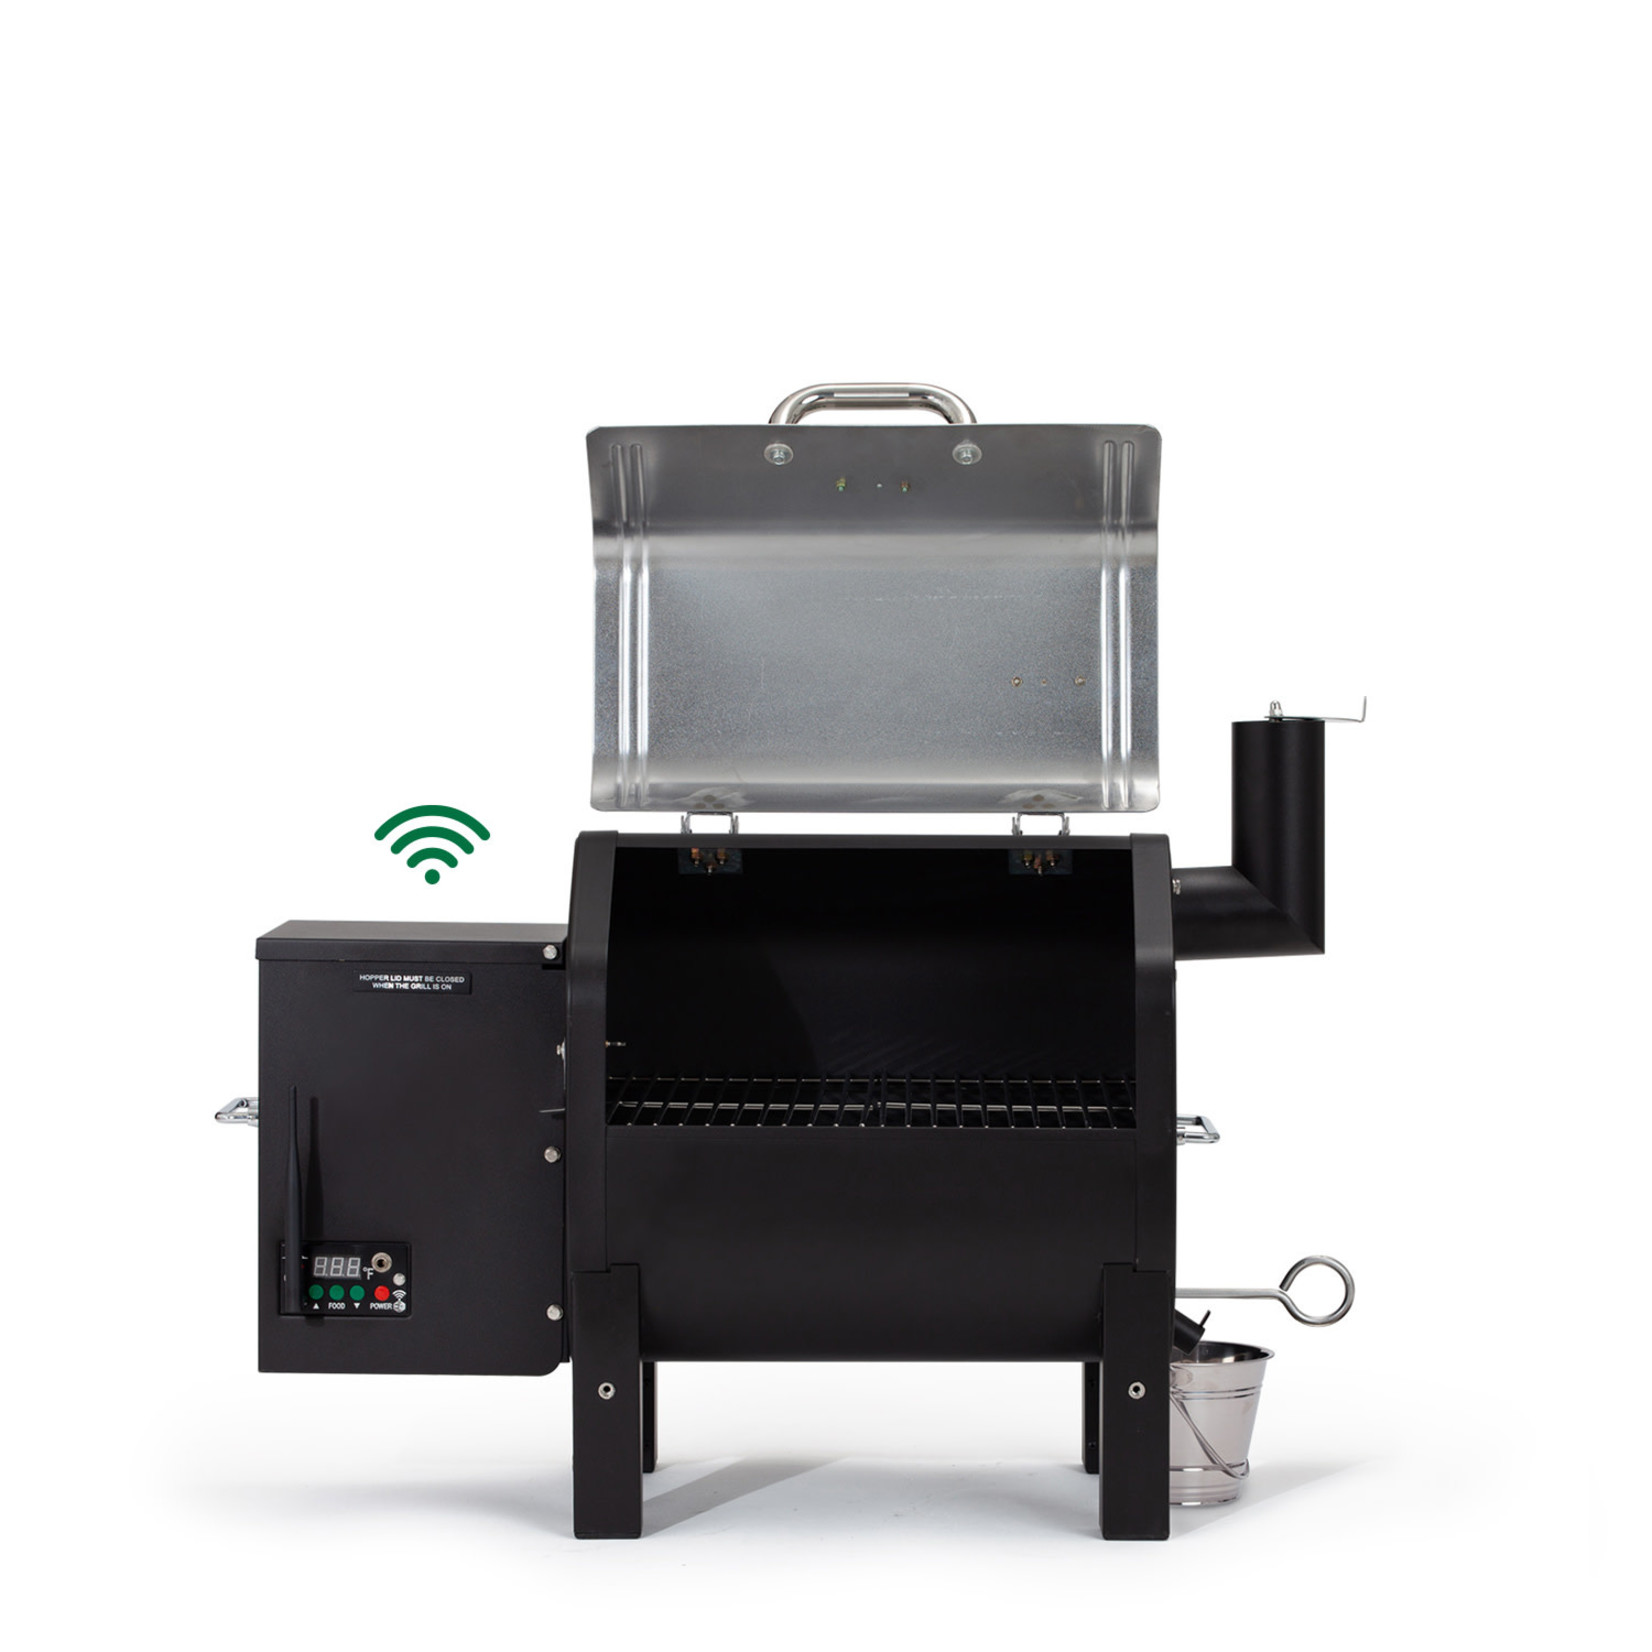 Green Mountain Grill Green Mountain Grill Davy Crockett portable pellet grill